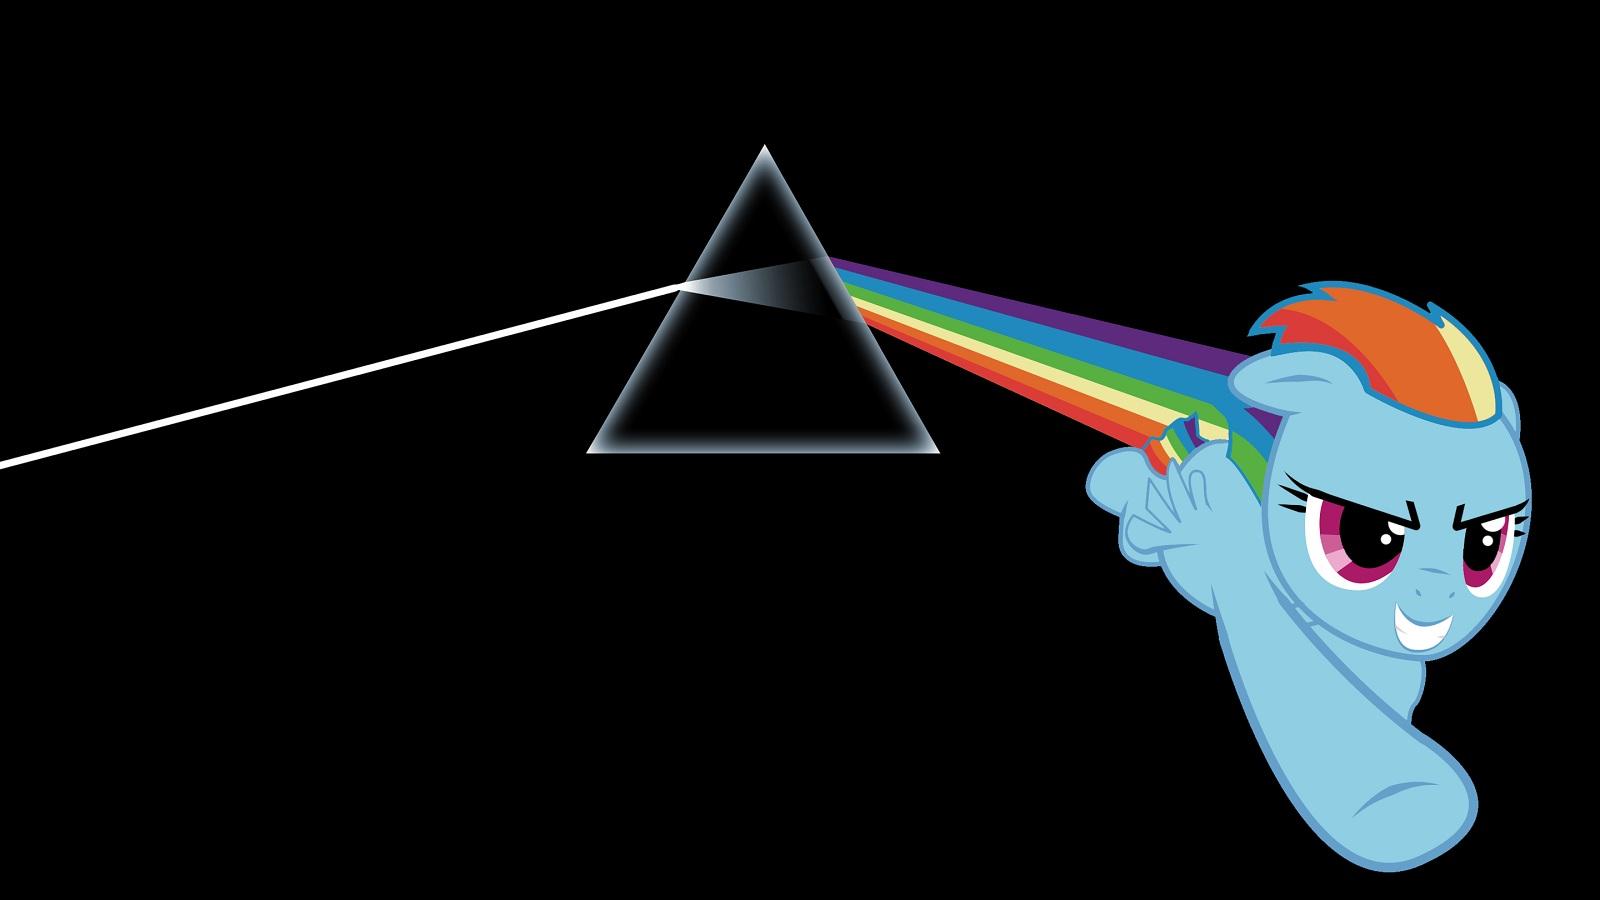 Pony The Dark Side Of The Moon Rainbow Dash wallpaper background 1600x900